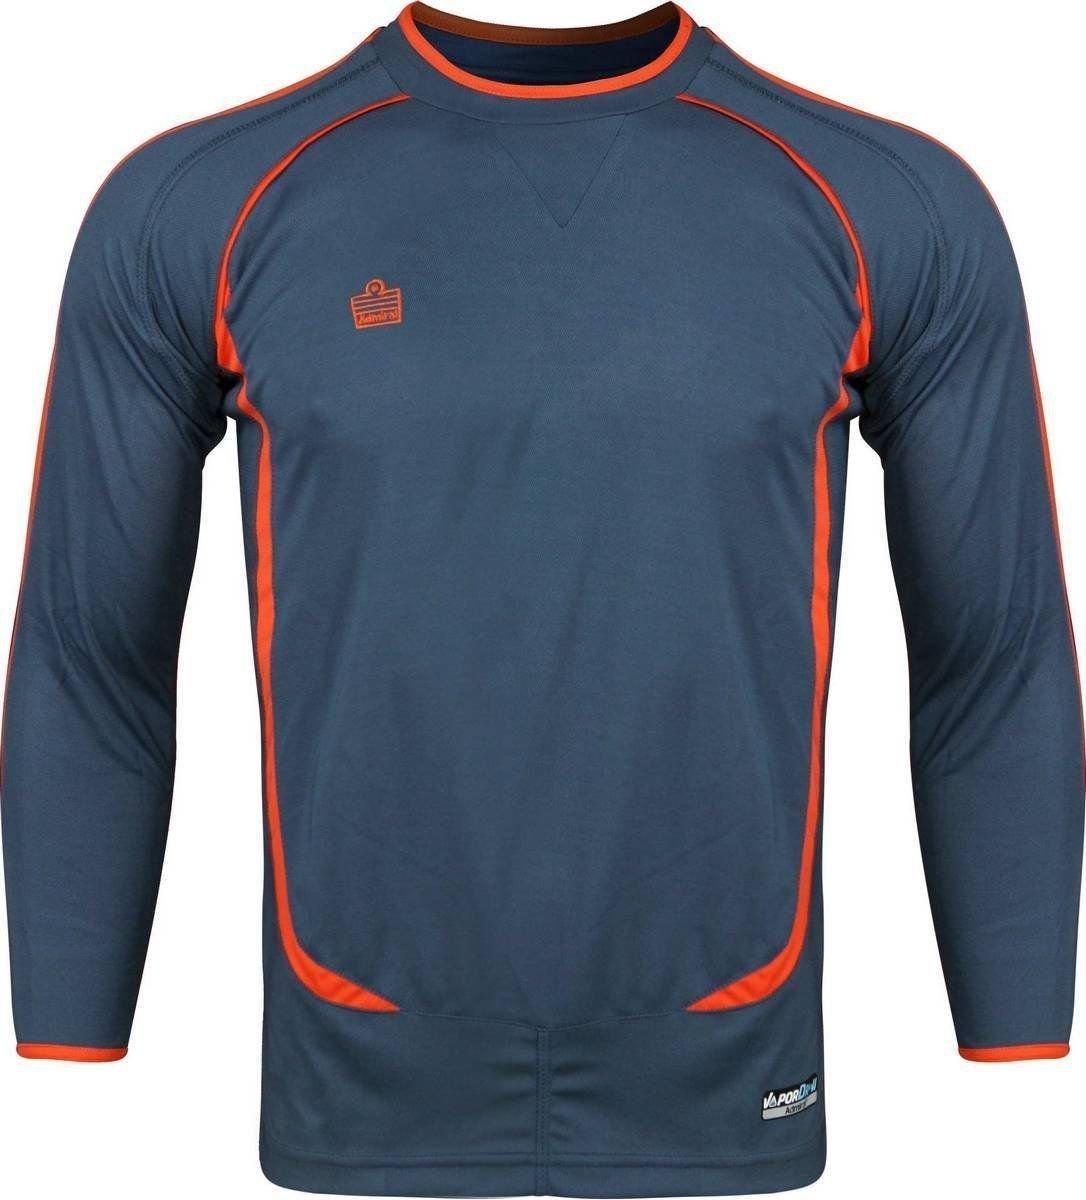 Cheap Soccer Goalie Pads, find Soccer Goalie Pads deals on line at